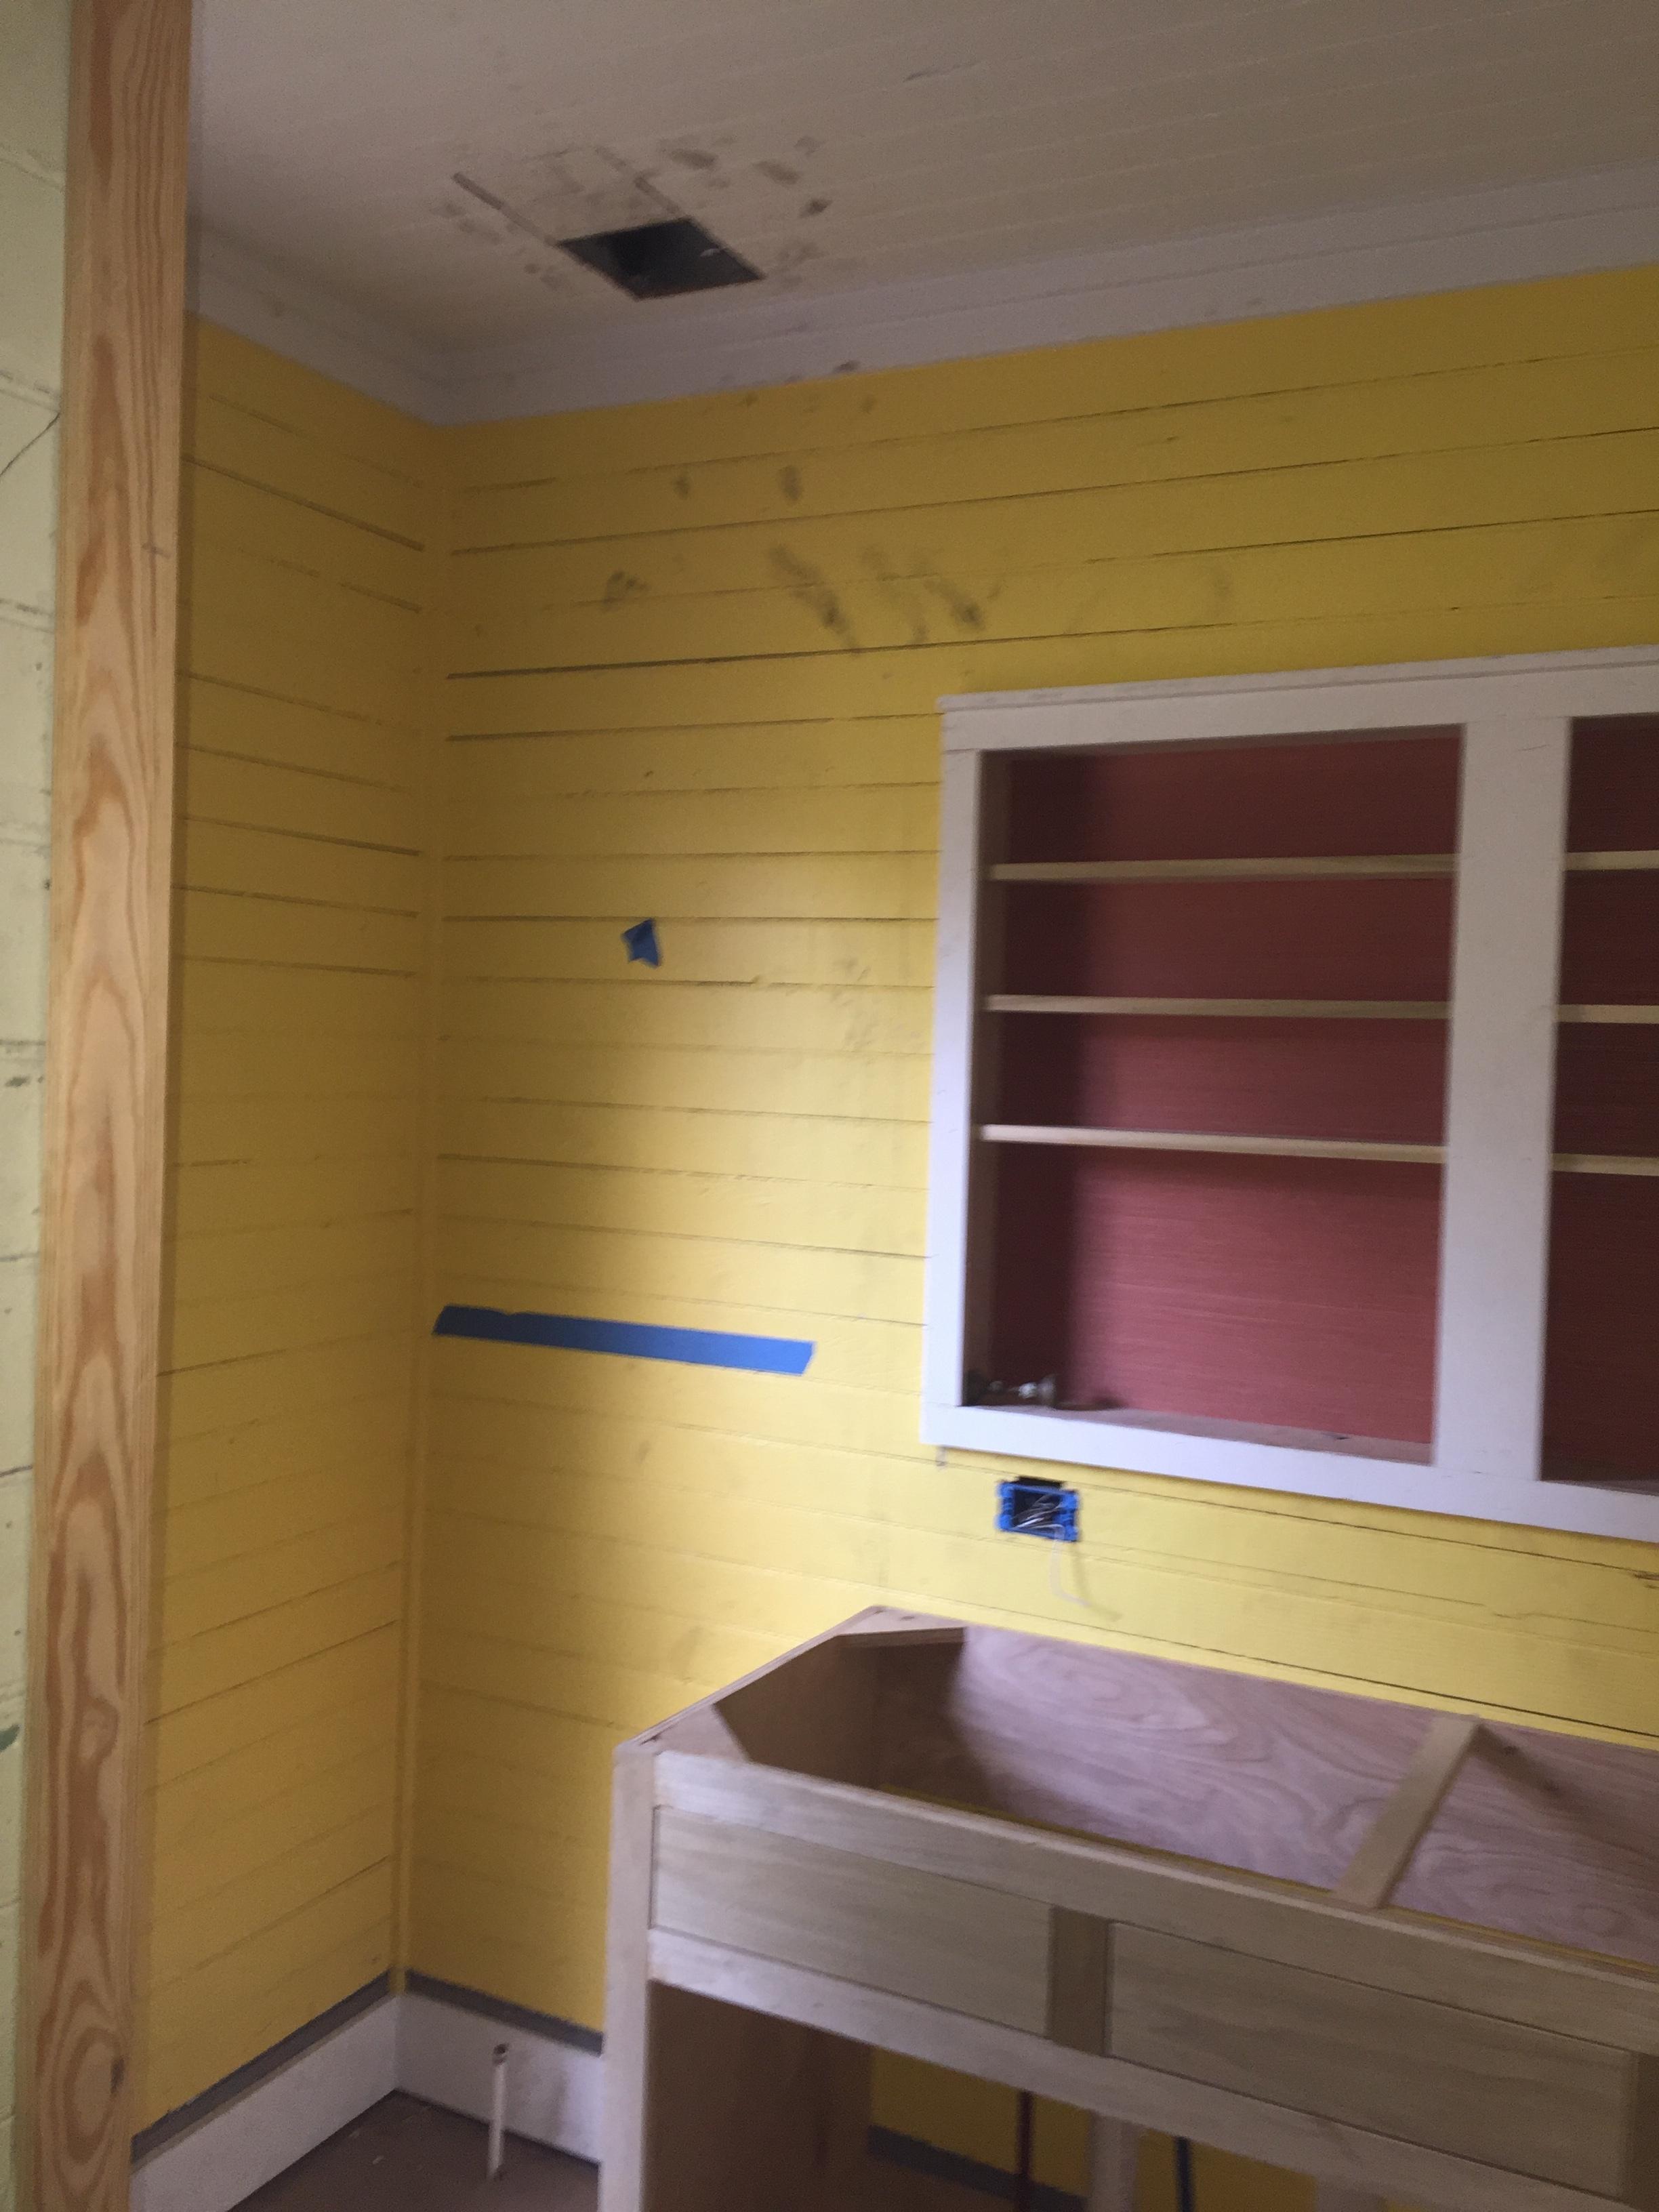 Shealy Vanity Toilet Cabinet IN Progress BEFORE.jpg